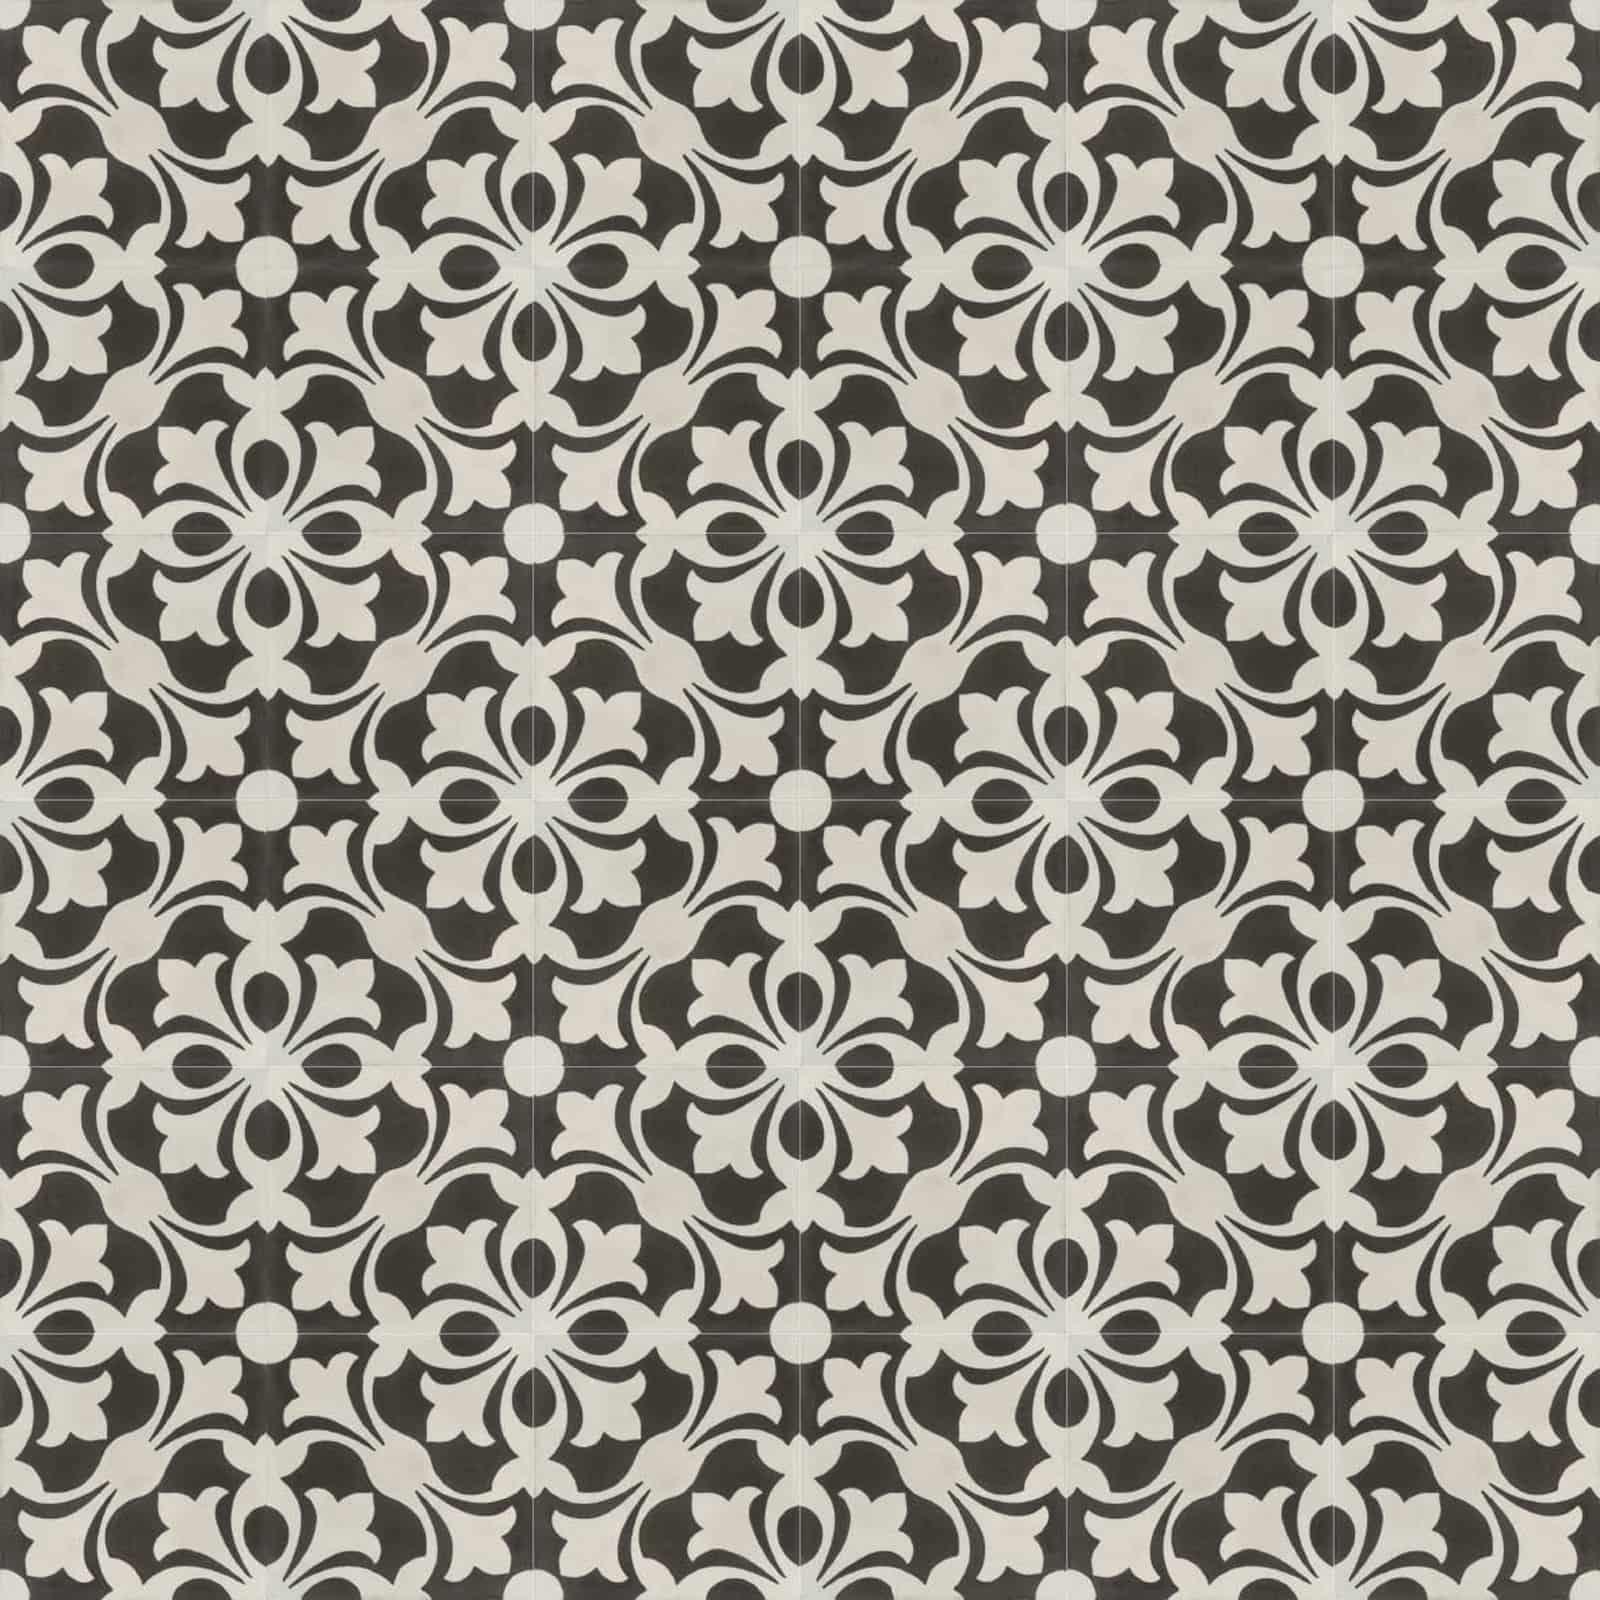 zementfliesen-verlegemuster-nummer-14260-viaplatten | 14260